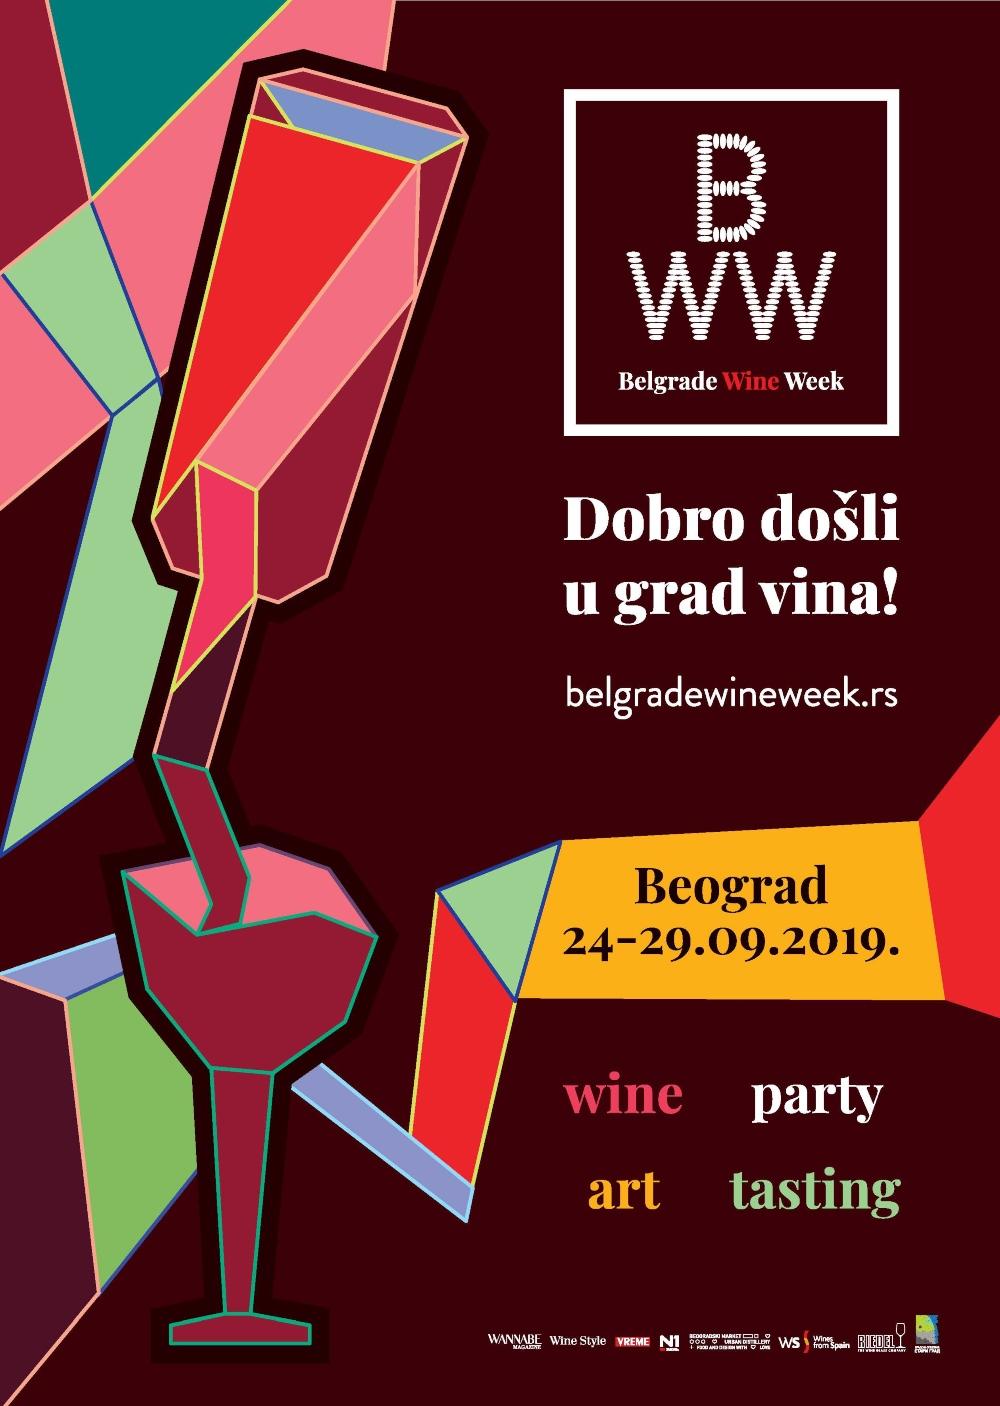 belgrade wine week Belgrade Wine Week: Najuzbudljivija vinska nedelja!